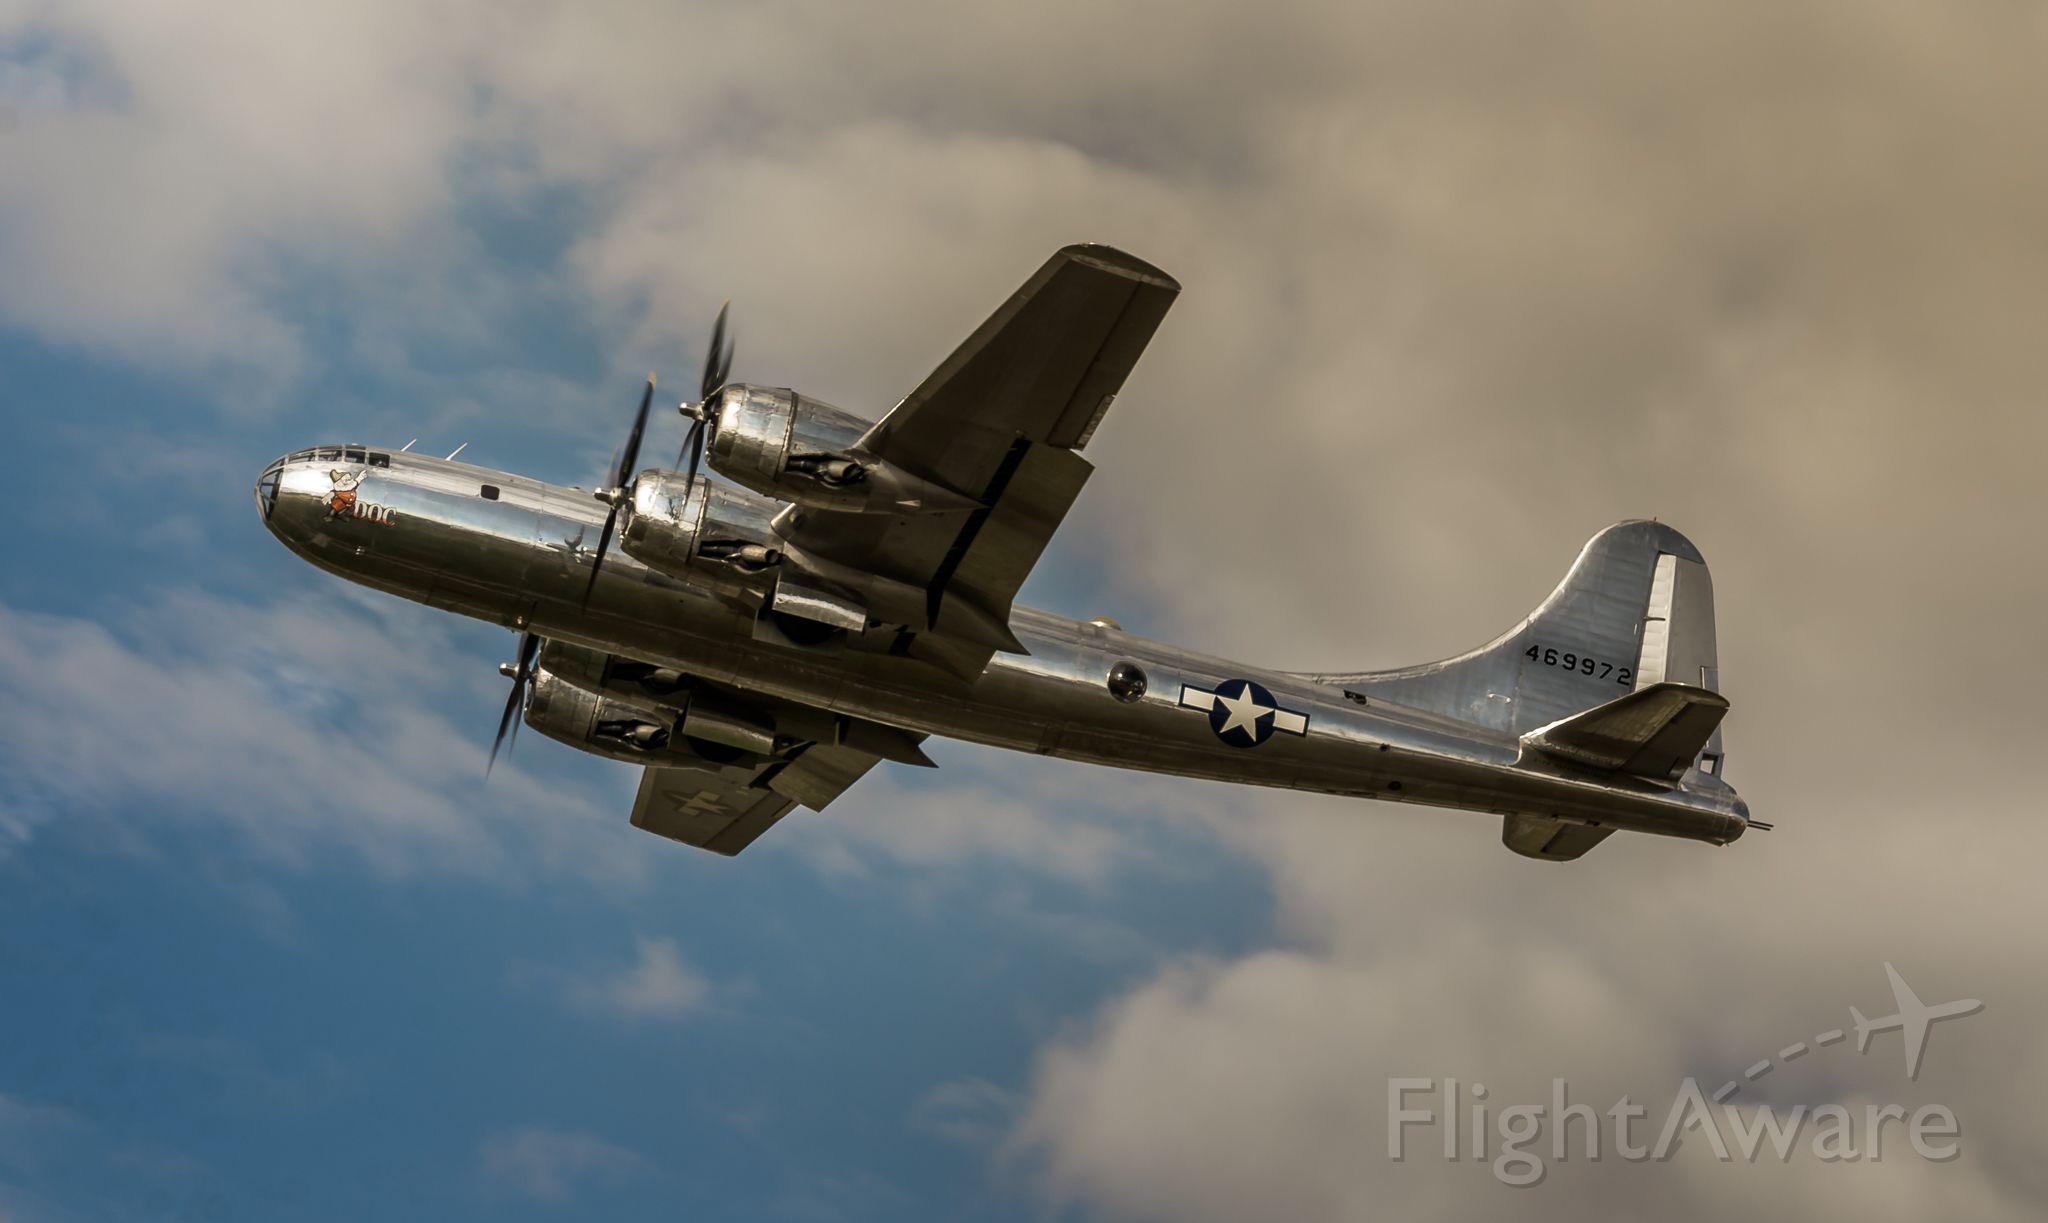 Boeing B-29 Superfortress (N9972)